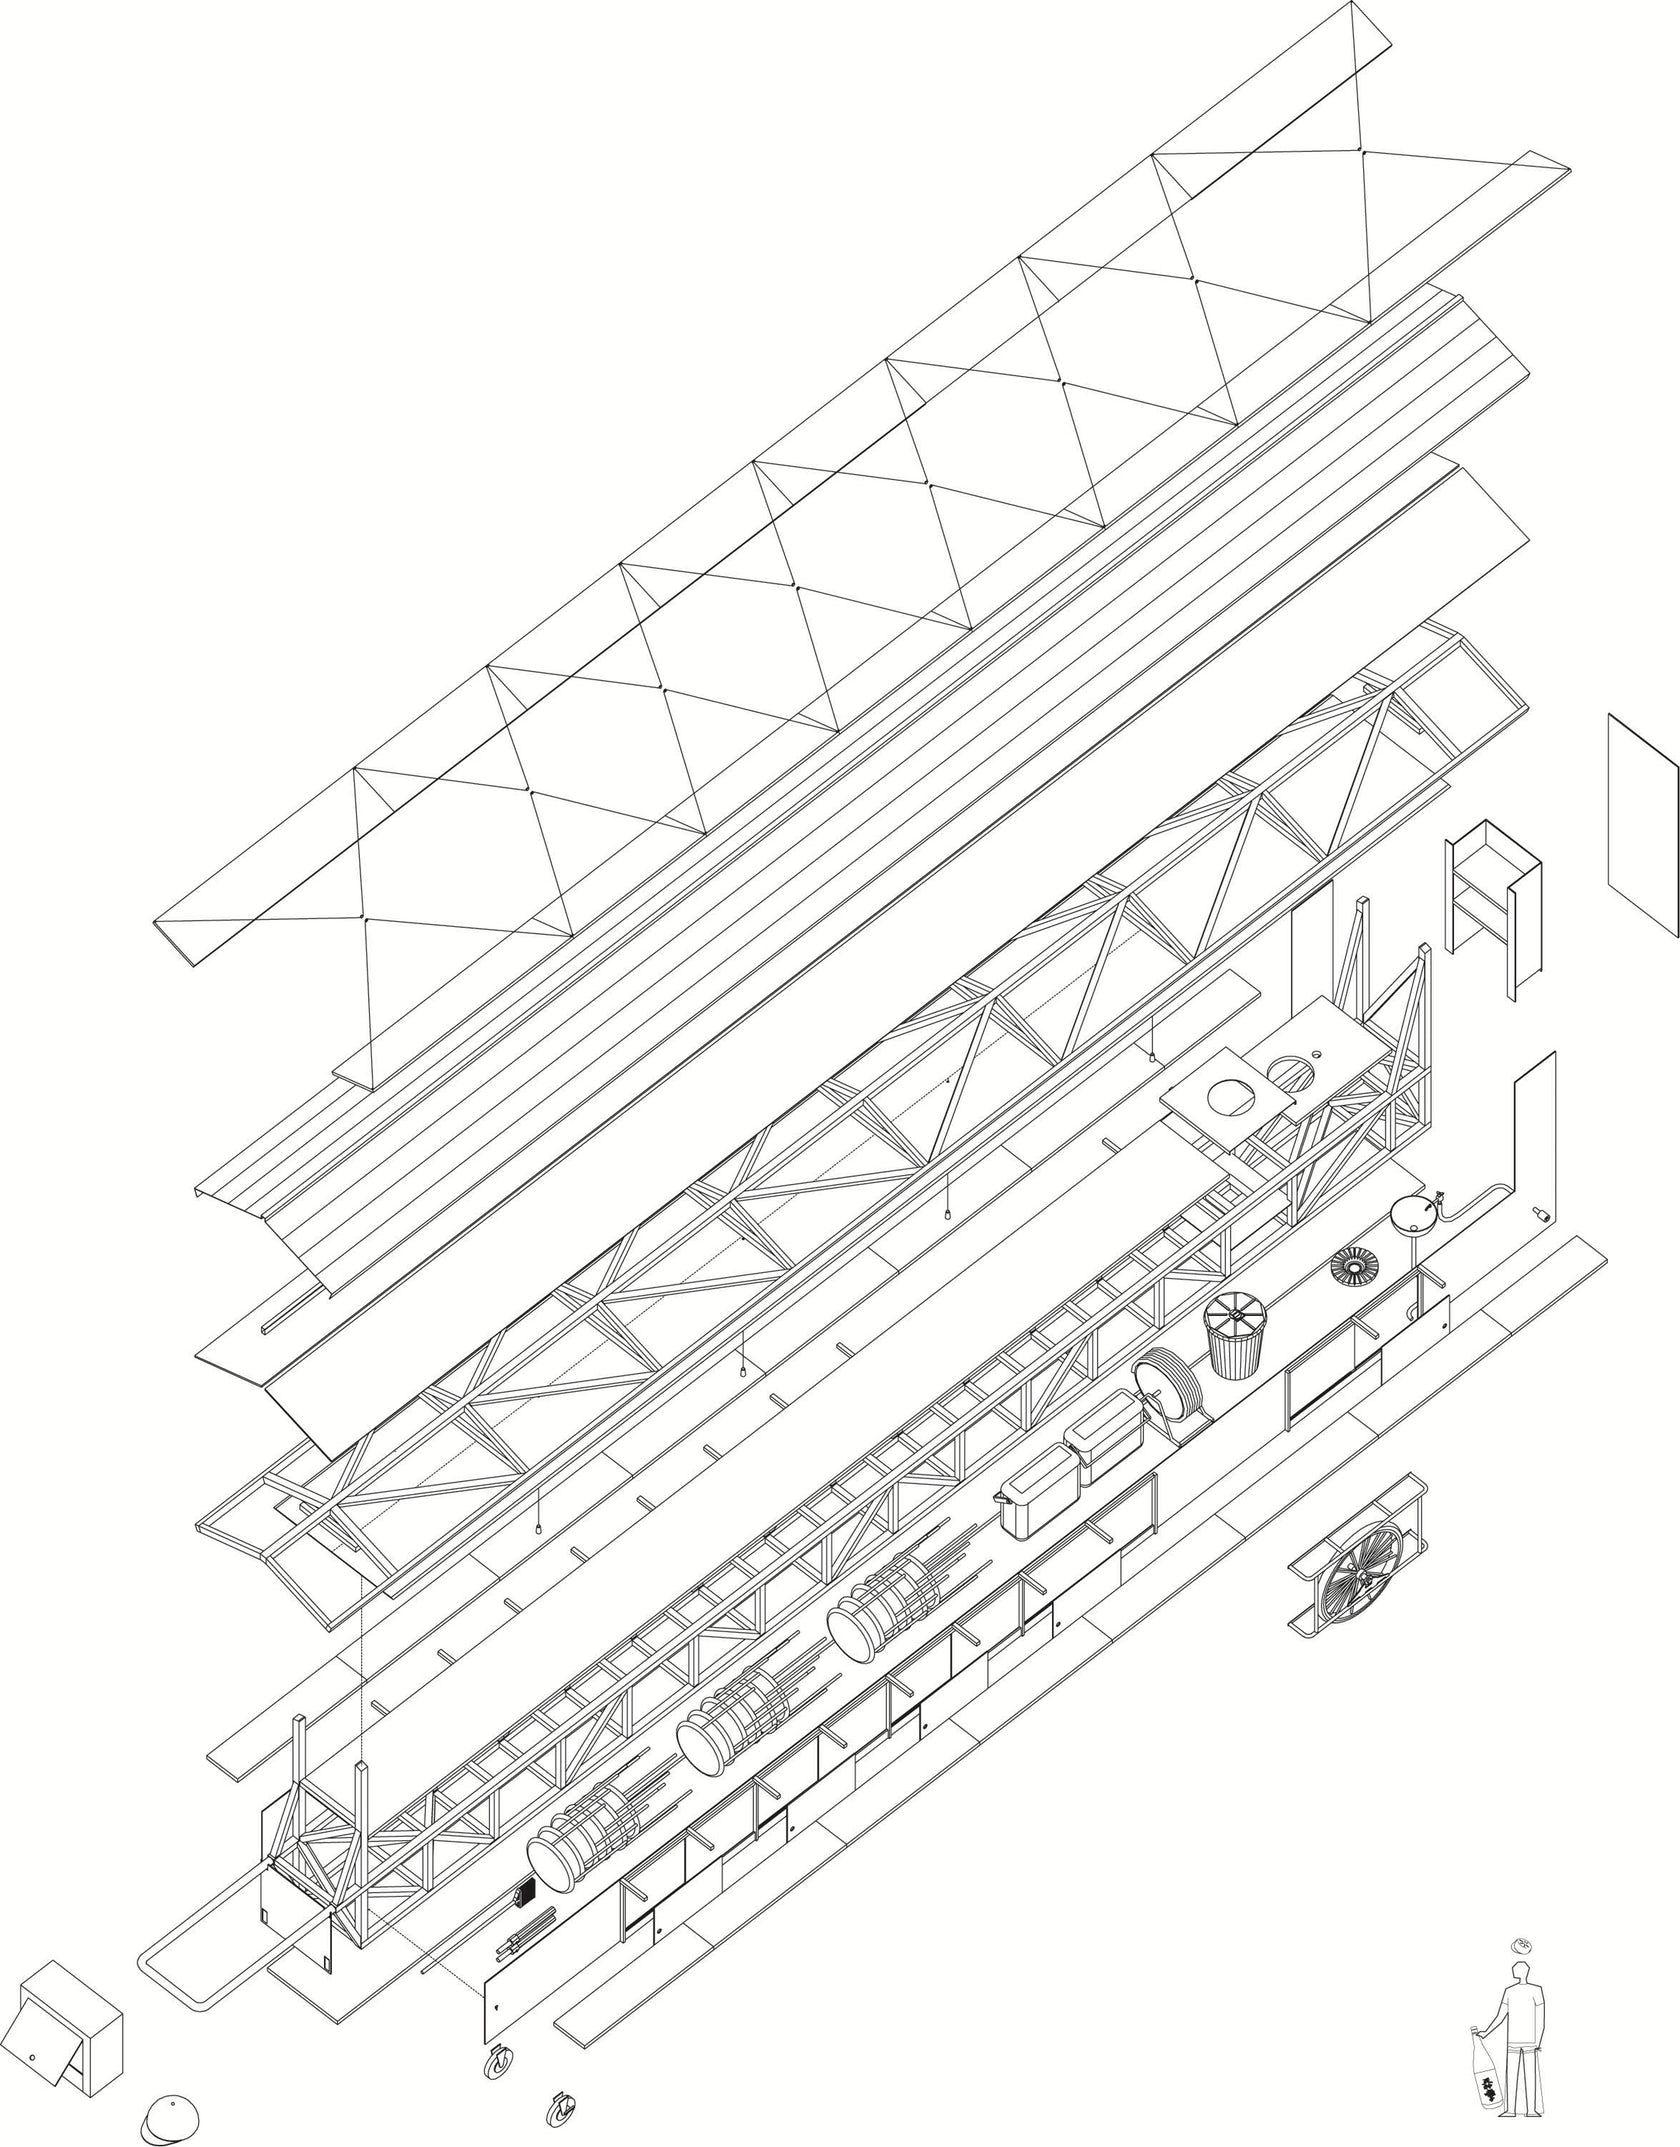 hight resolution of resultado de imagen para atelier bow wow white limousine yatai